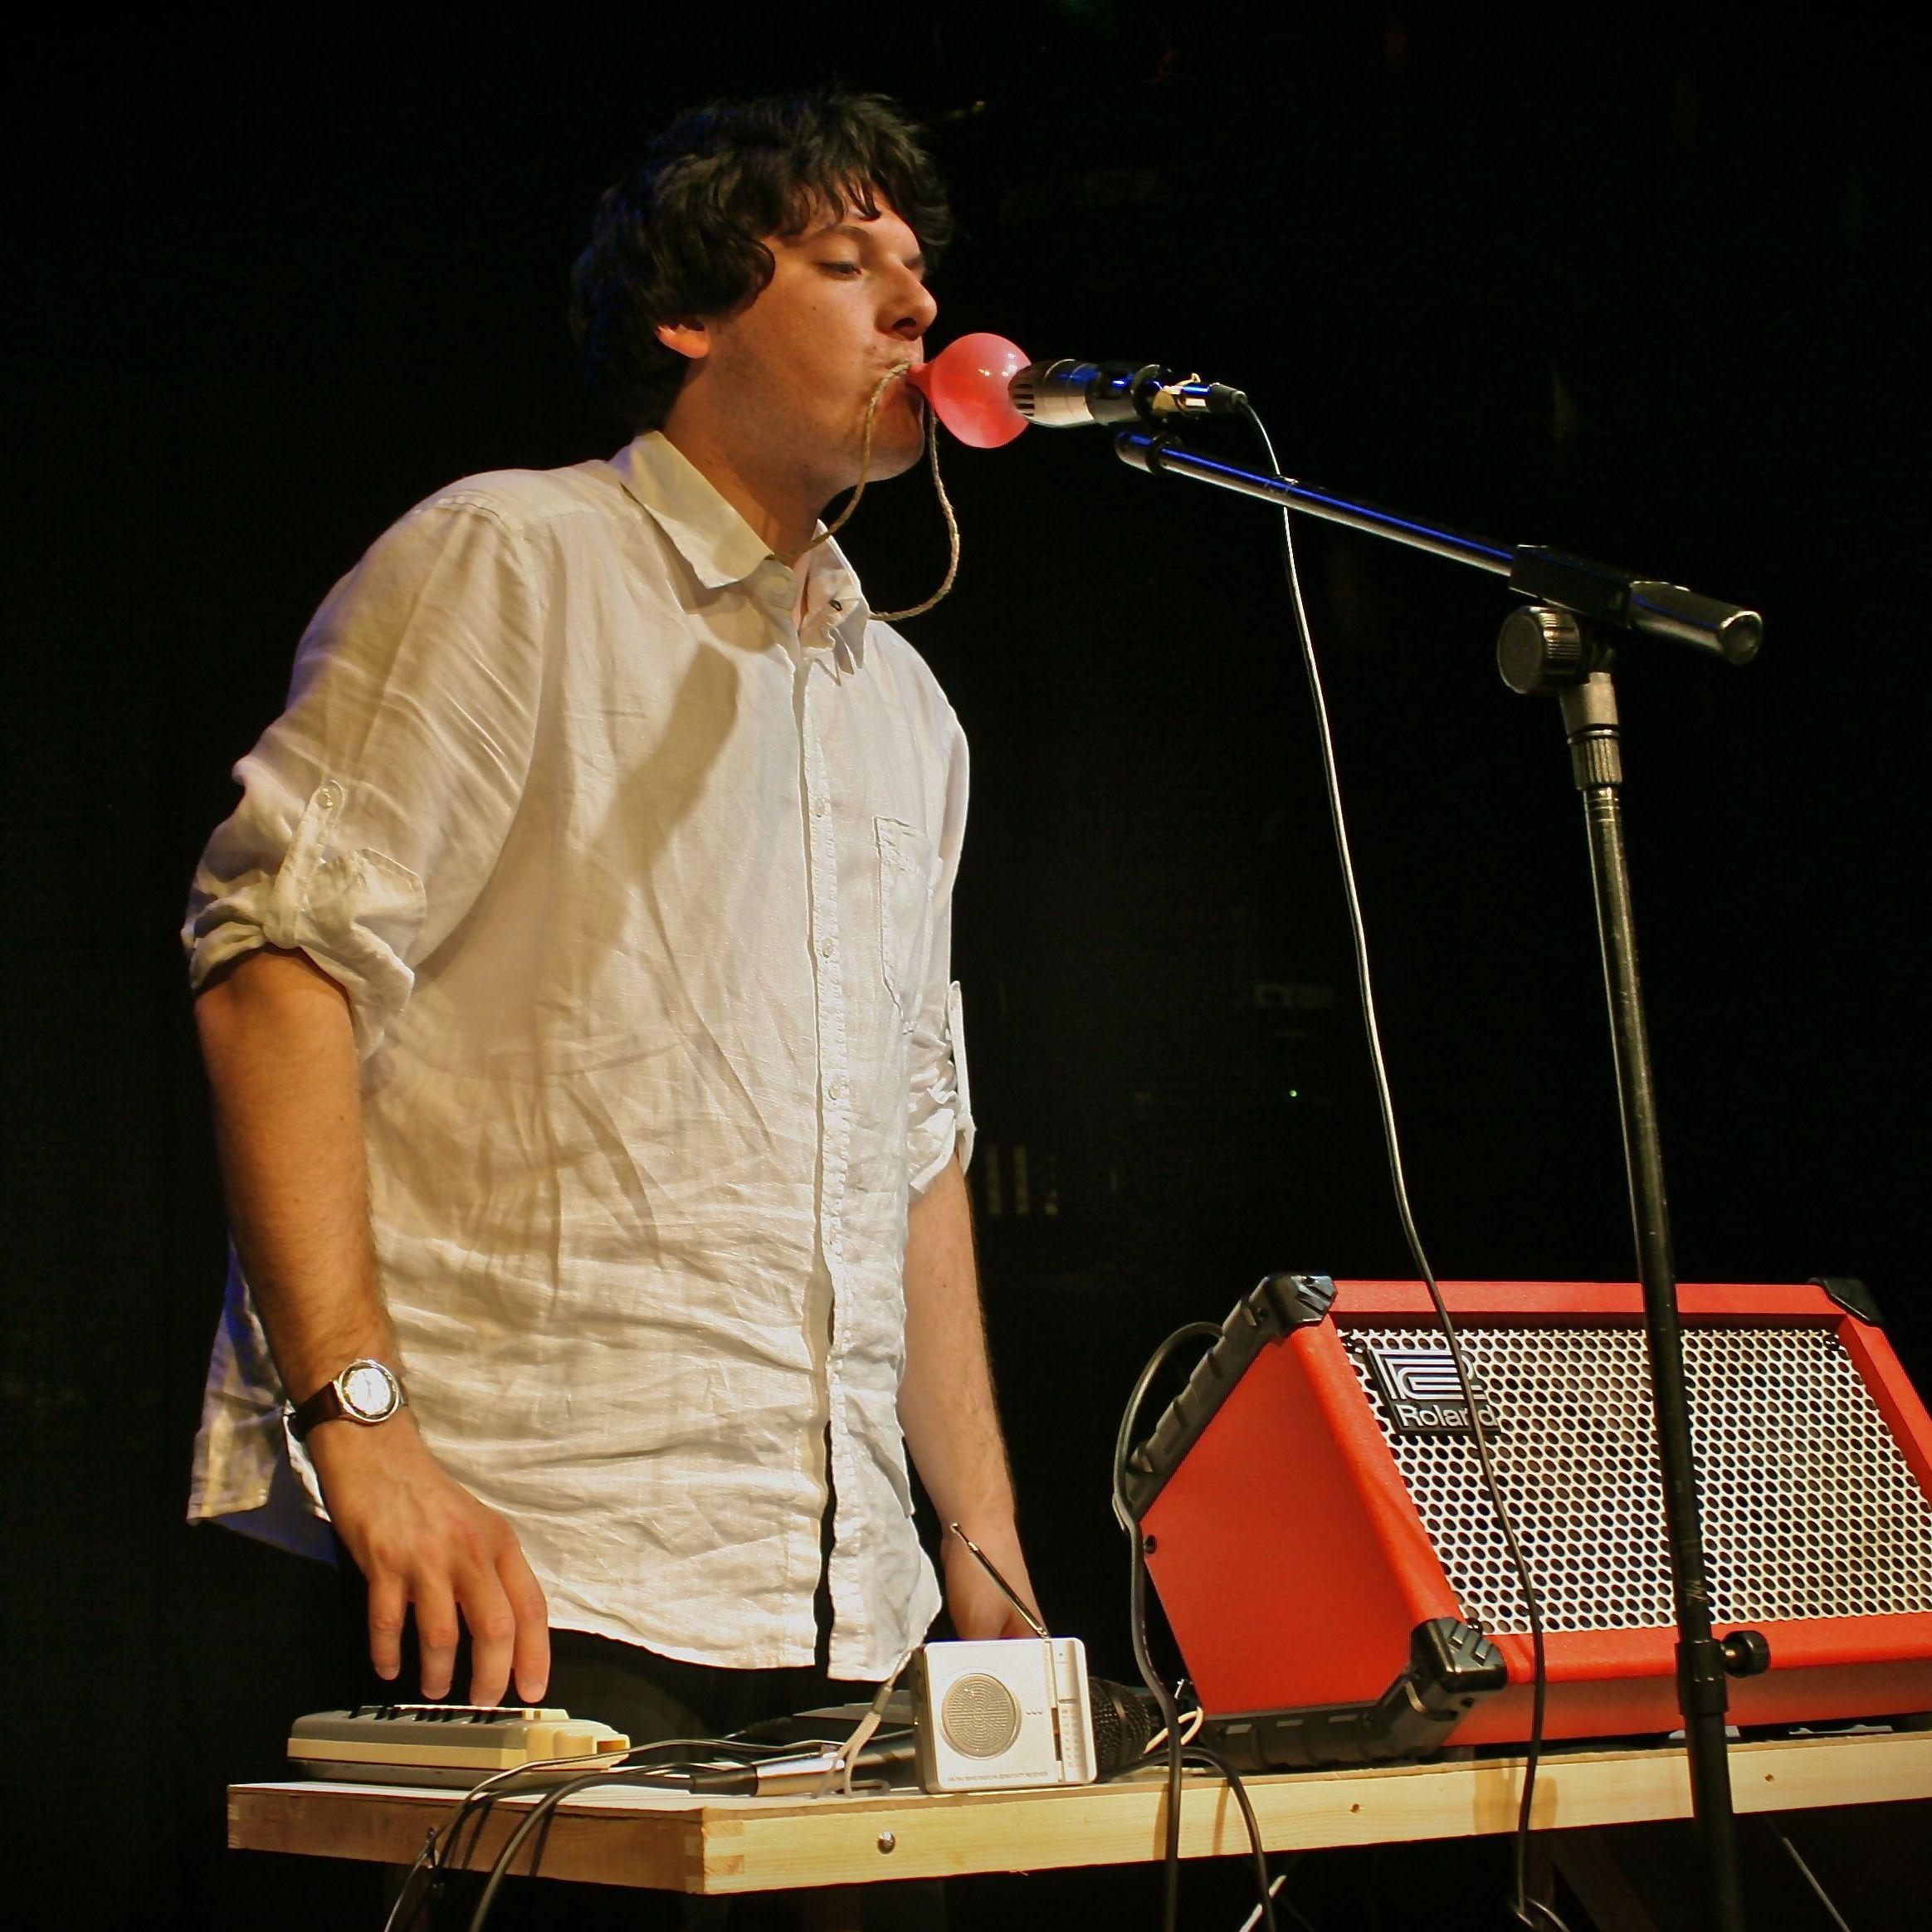 Ollie Evans